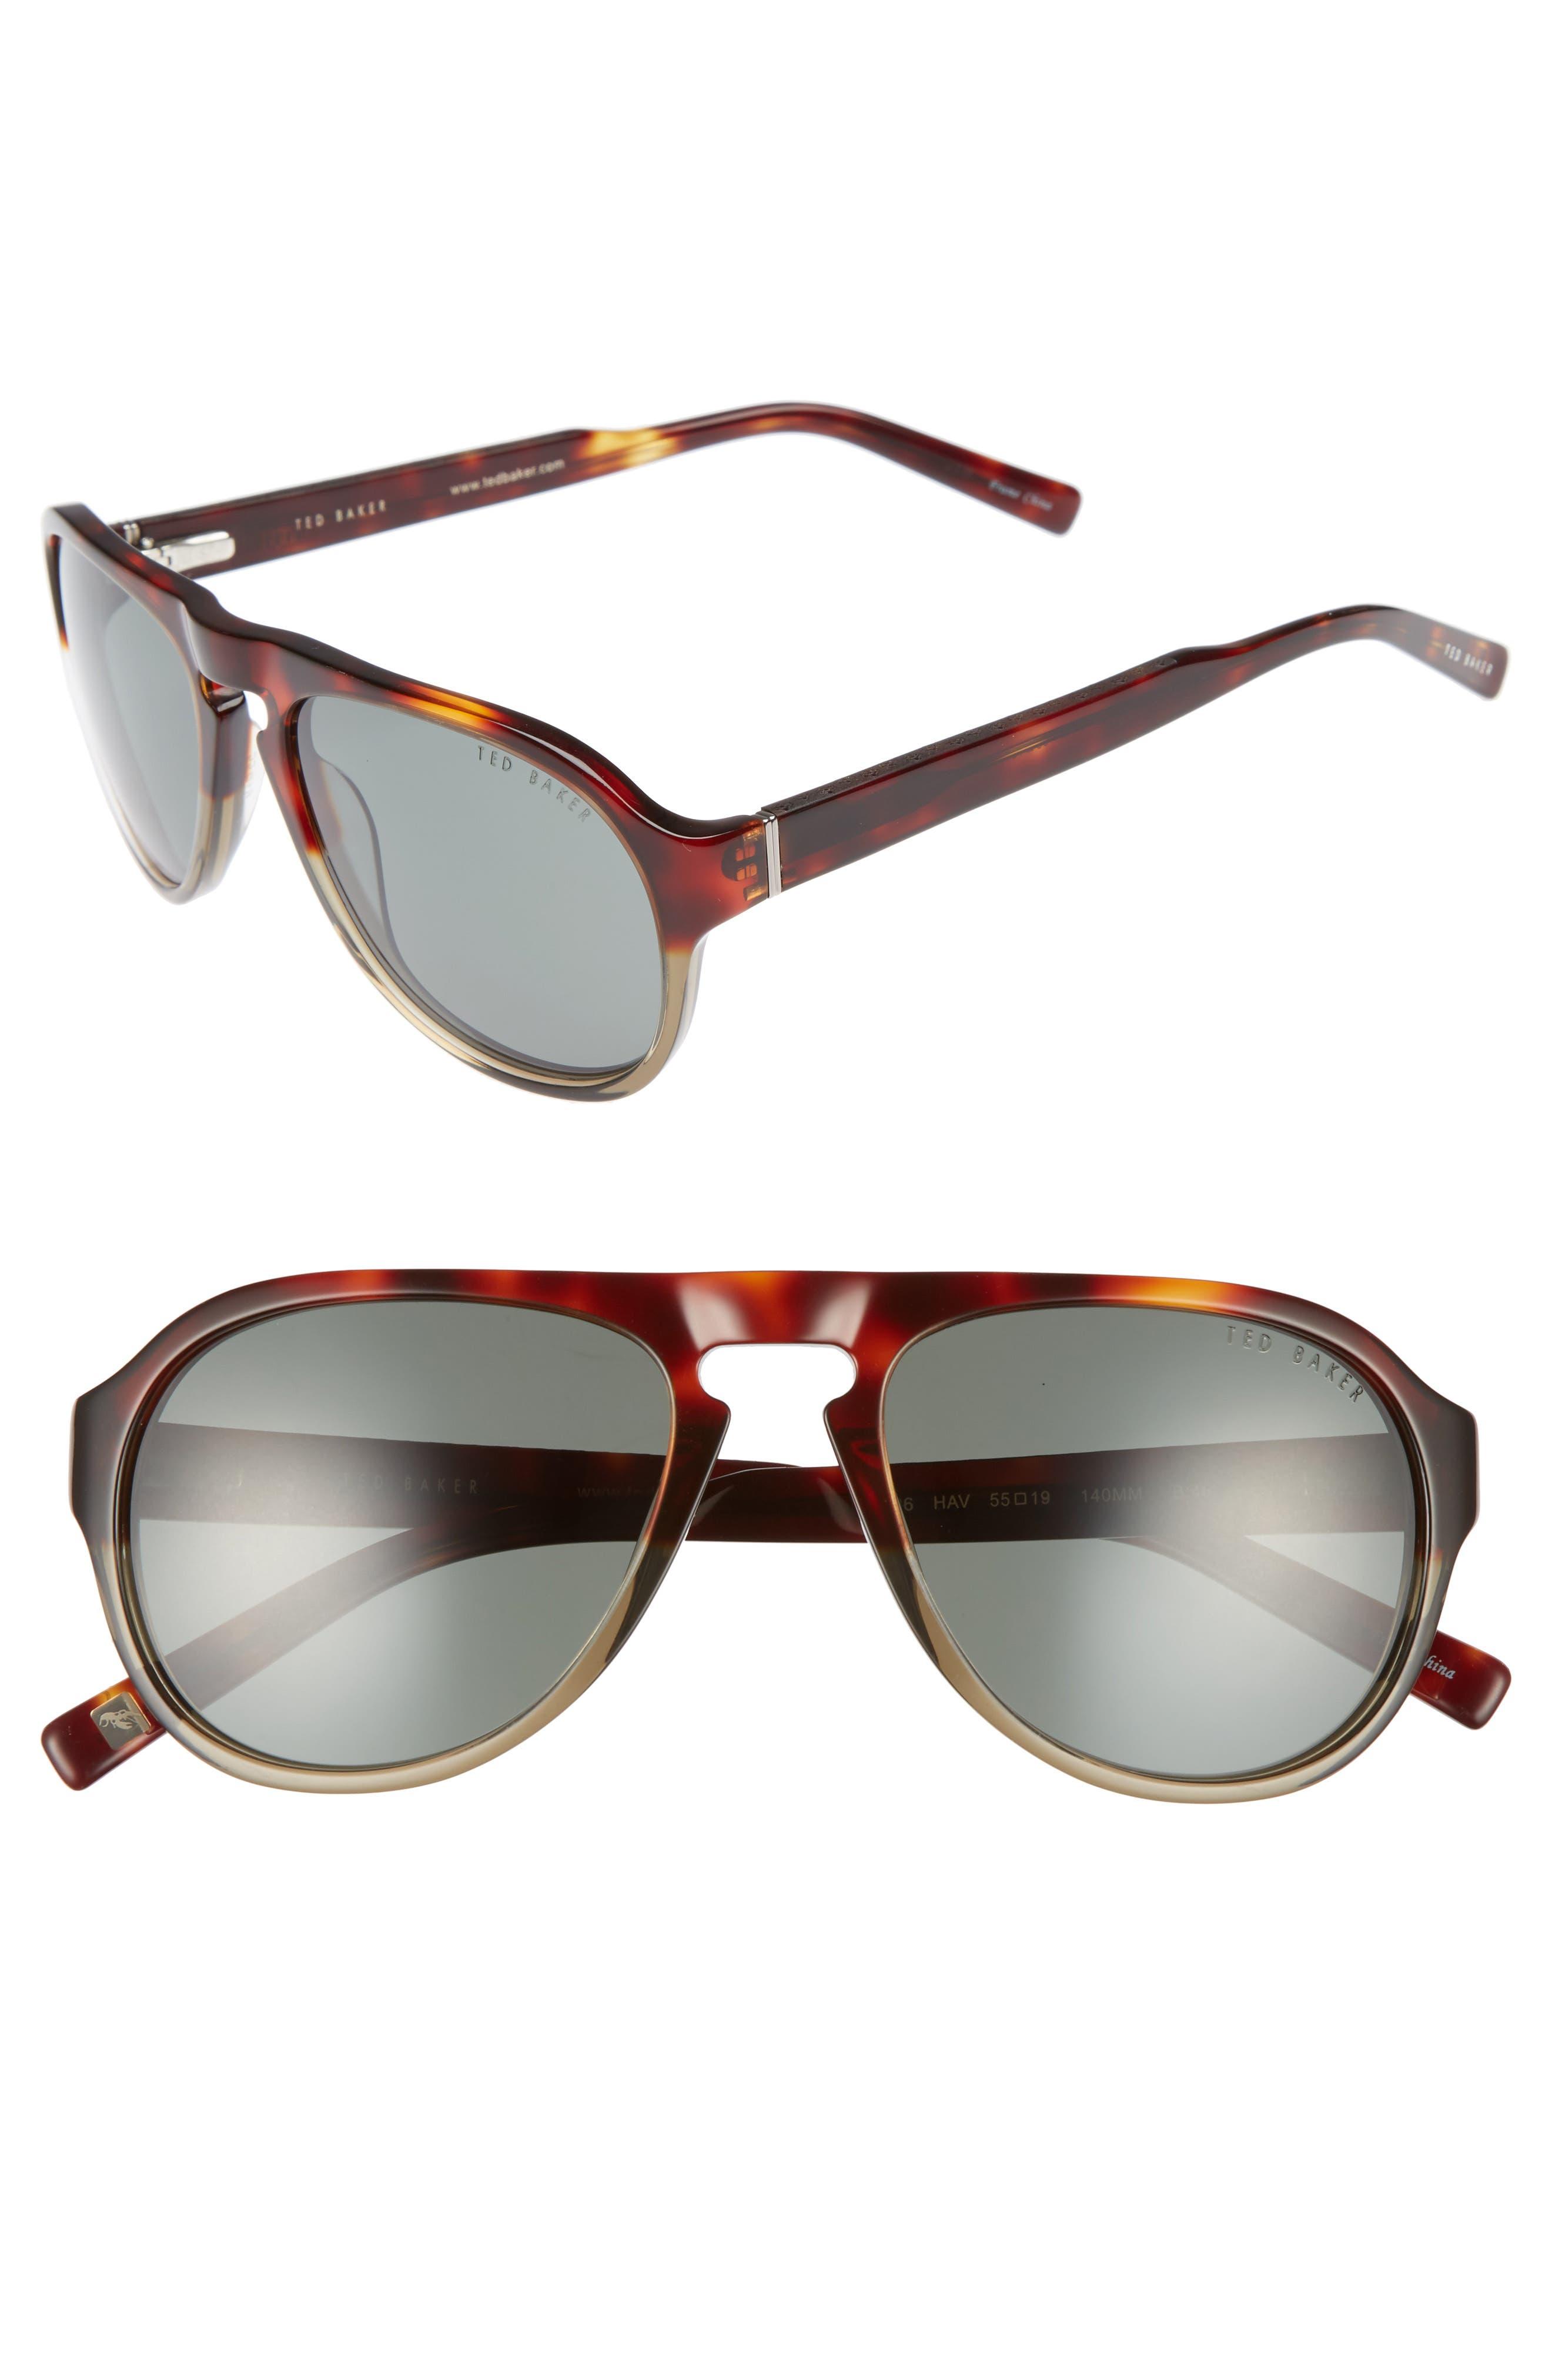 55mm Polarized Aviator Sunglasses,                         Main,                         color, Tortoise Havana